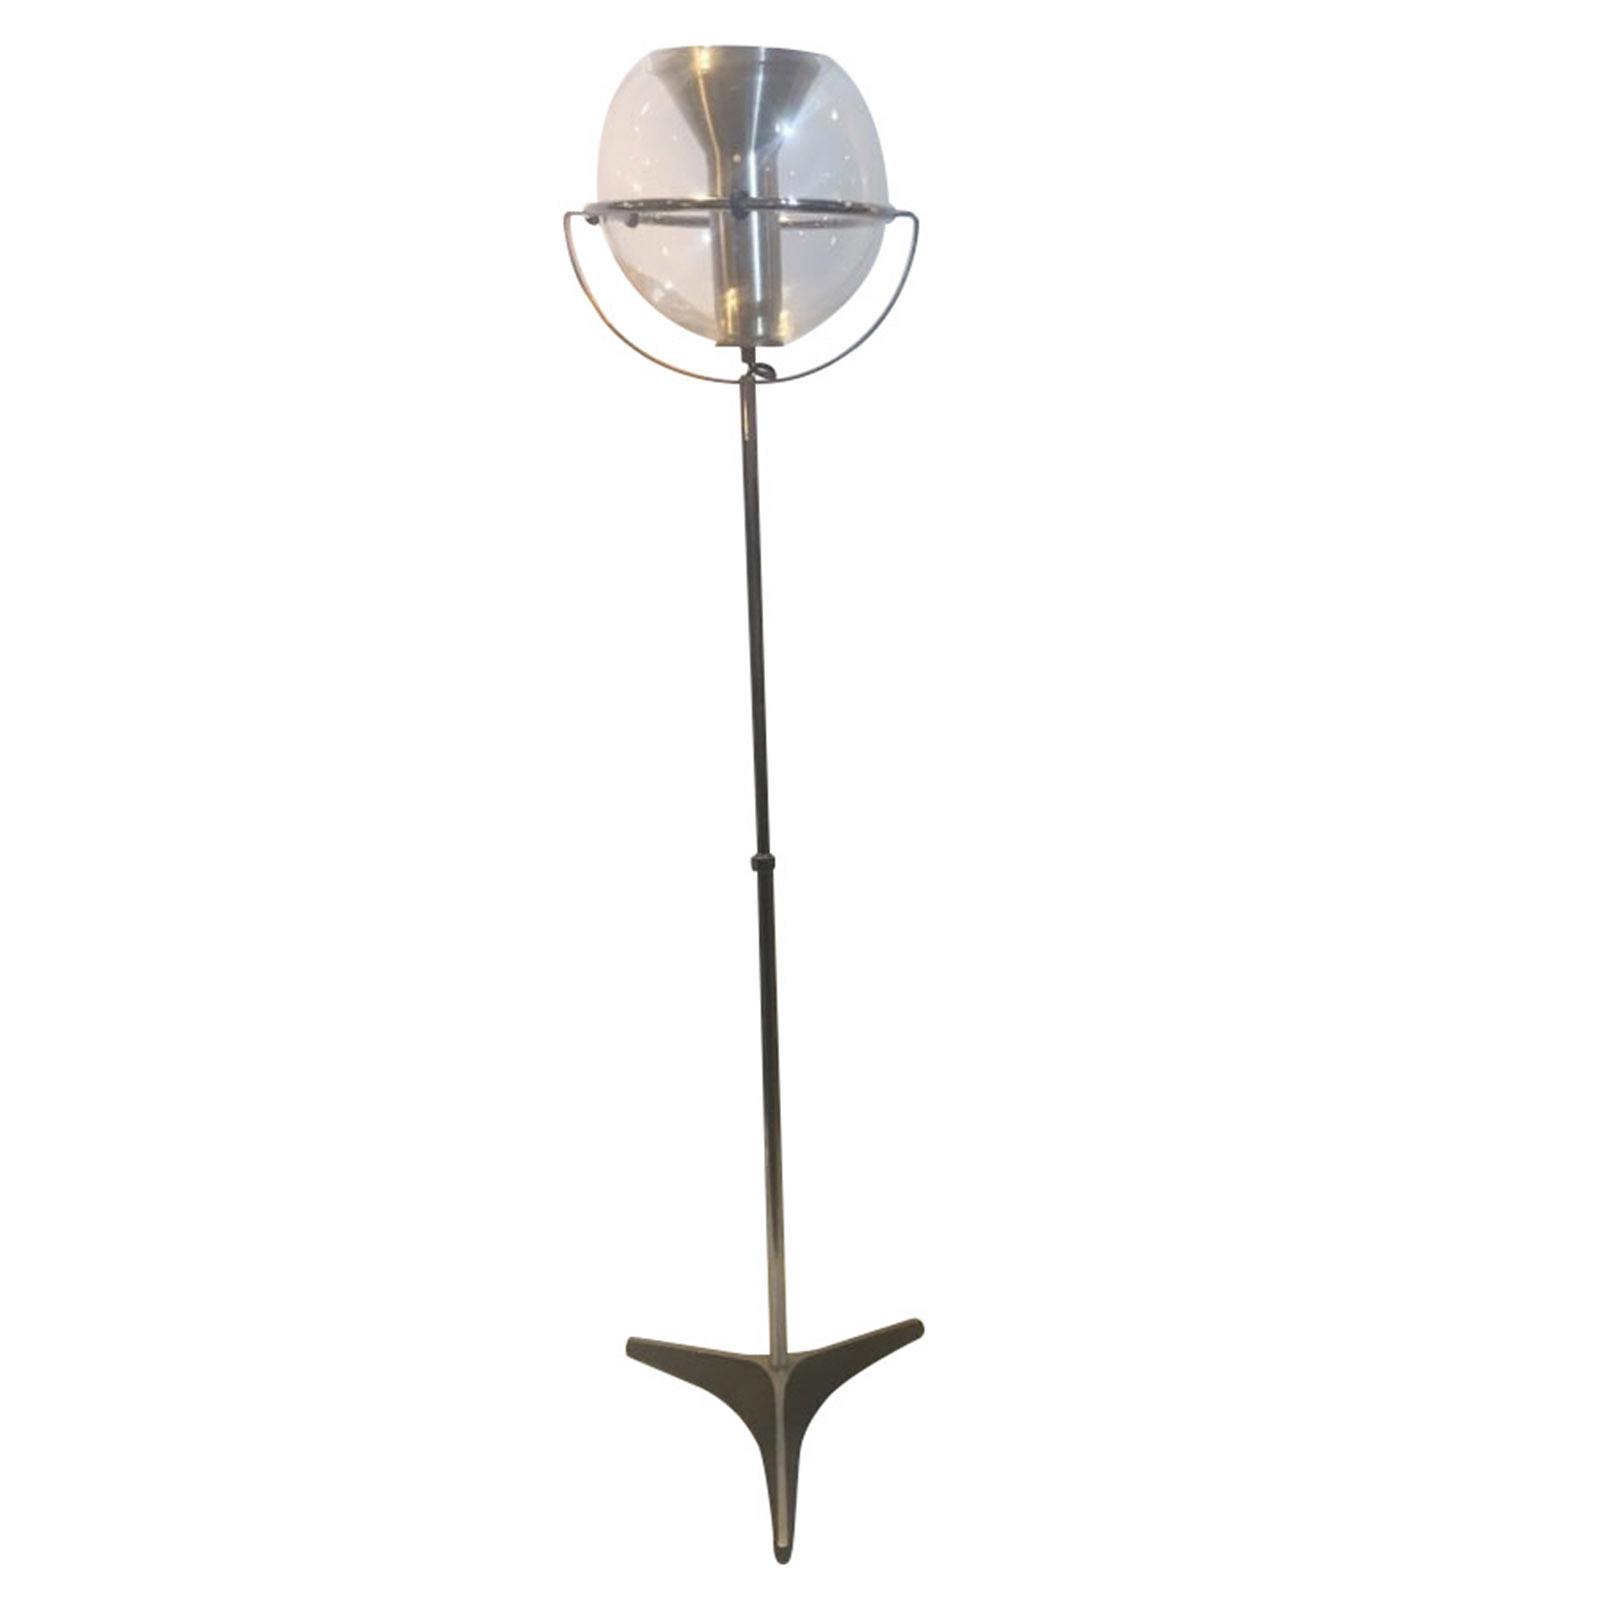 Cool Vintage Adjustable Chrome Standard Lamp